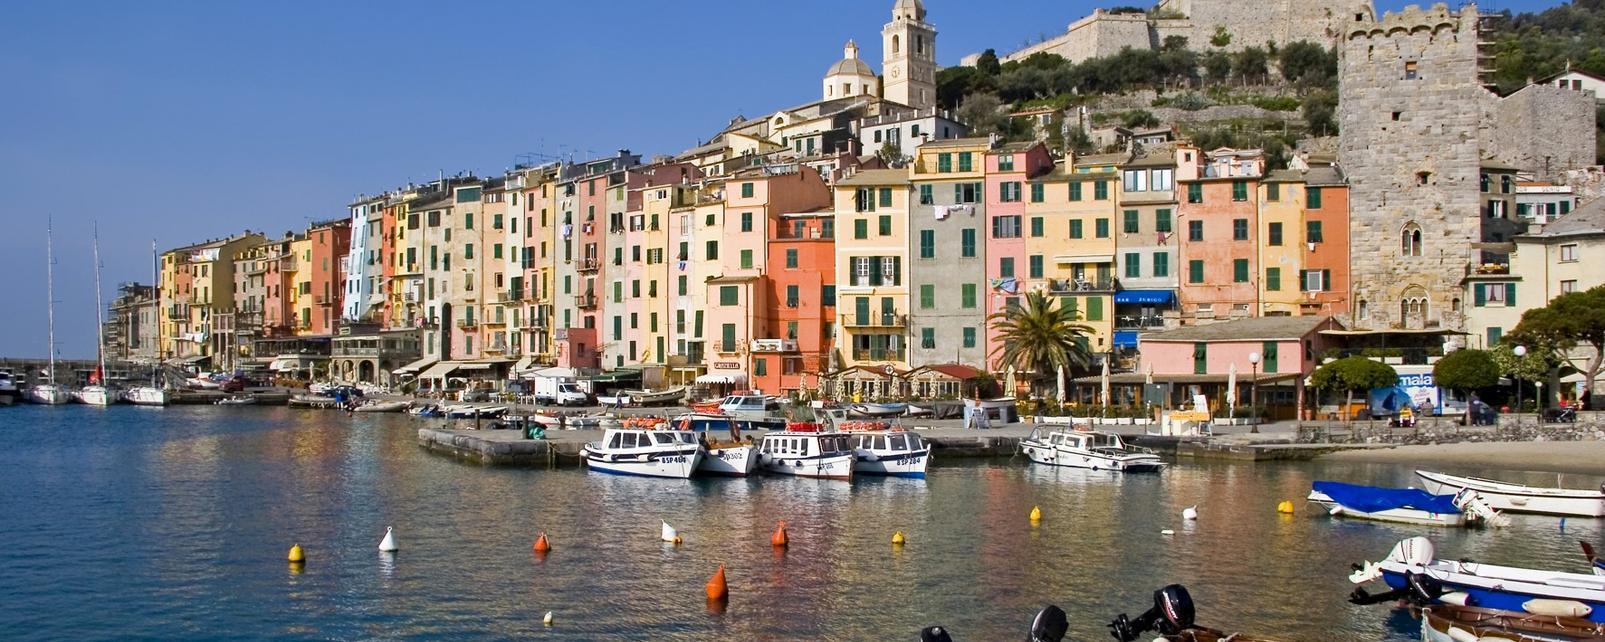 Portovenere Guide Des Villes D Italie Easyvoyage